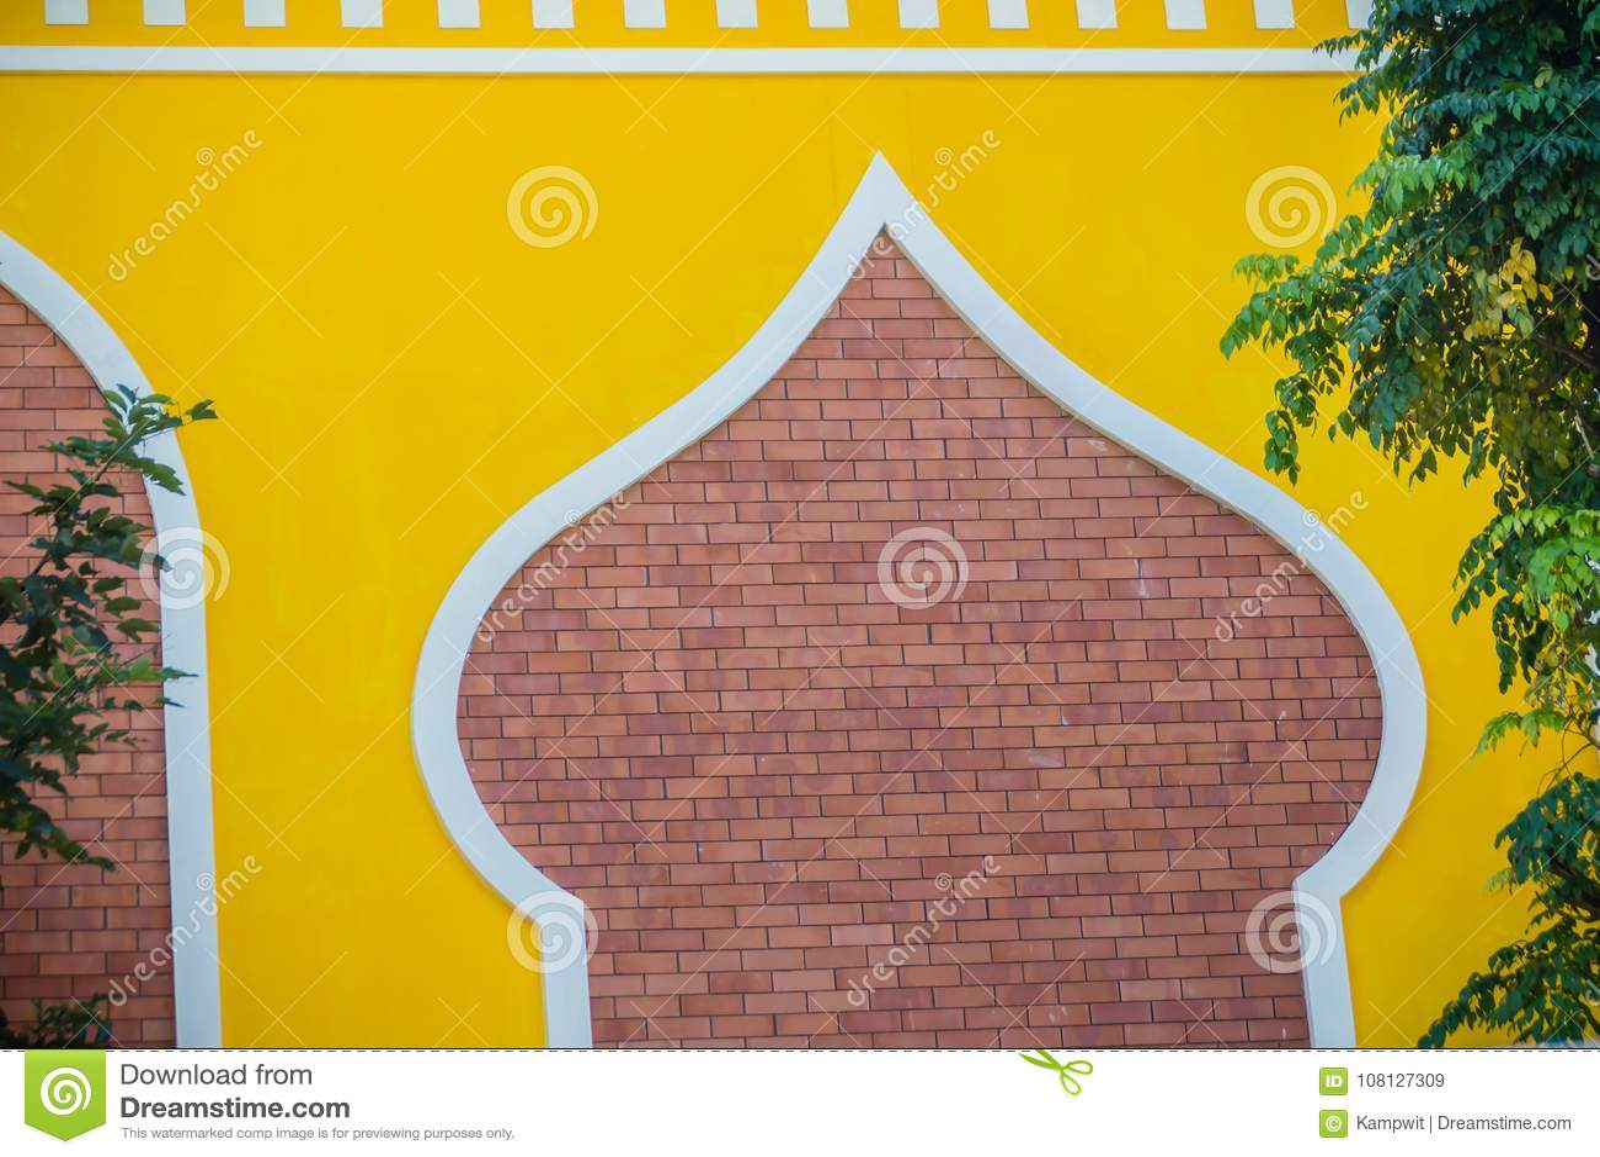 Unique Brick Wall Decorating Tips Photo - The Wall Art Decorations ...